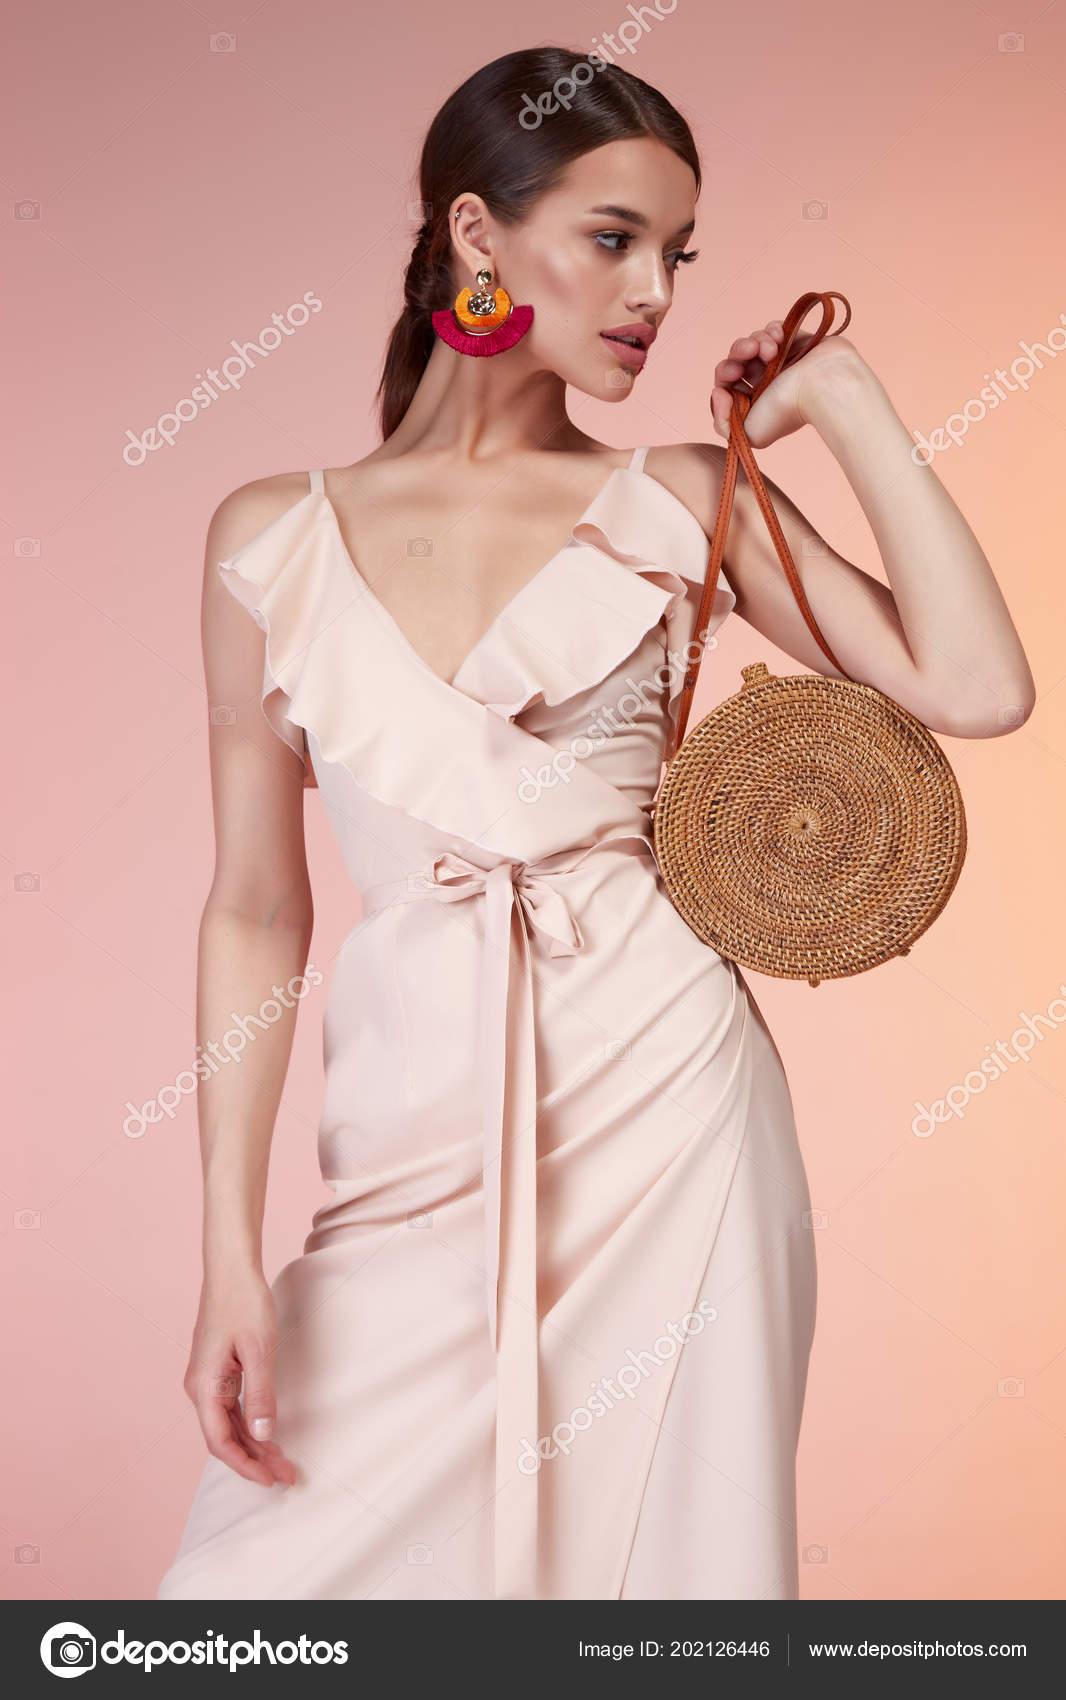 593e7db03 Mujer elegante sexy belleza moda estilo ropa vestido beige seda formal  casual señora romántica reunión fecha partido estilo glamour modelo morena  morenas ...